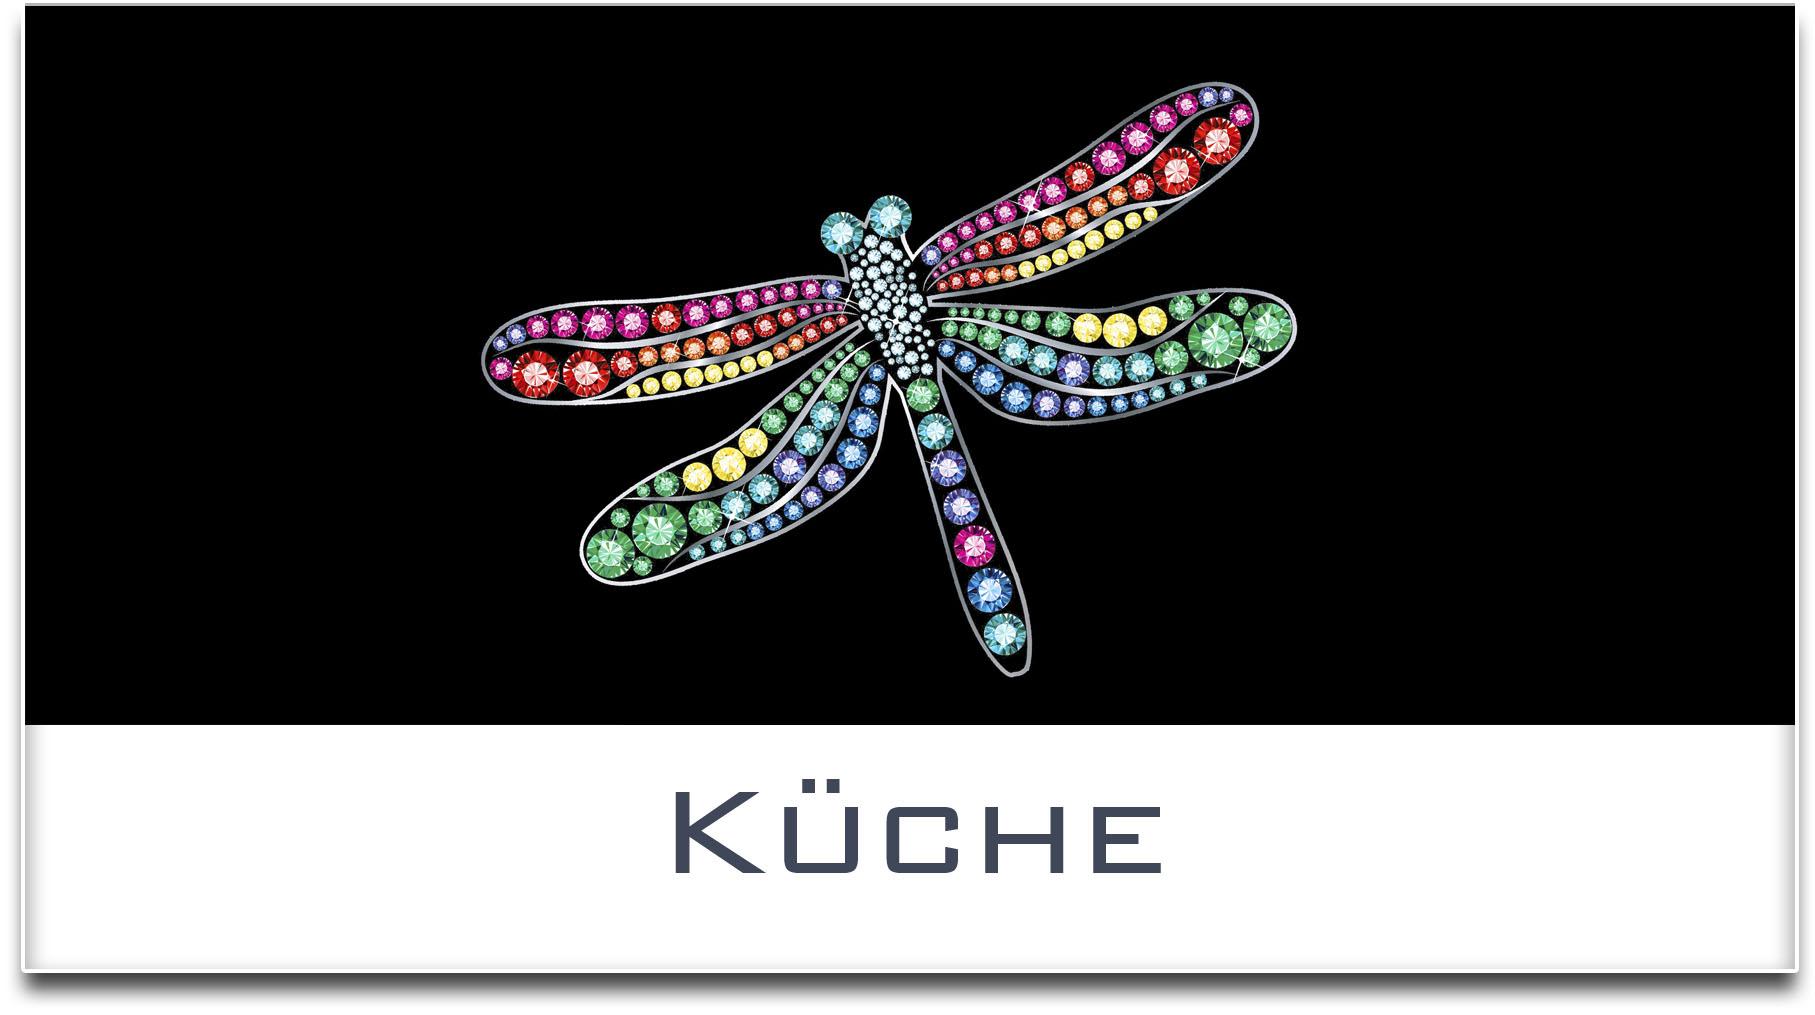 Türschild / Haustürschild / Libelle / Küche / Selbstklebend